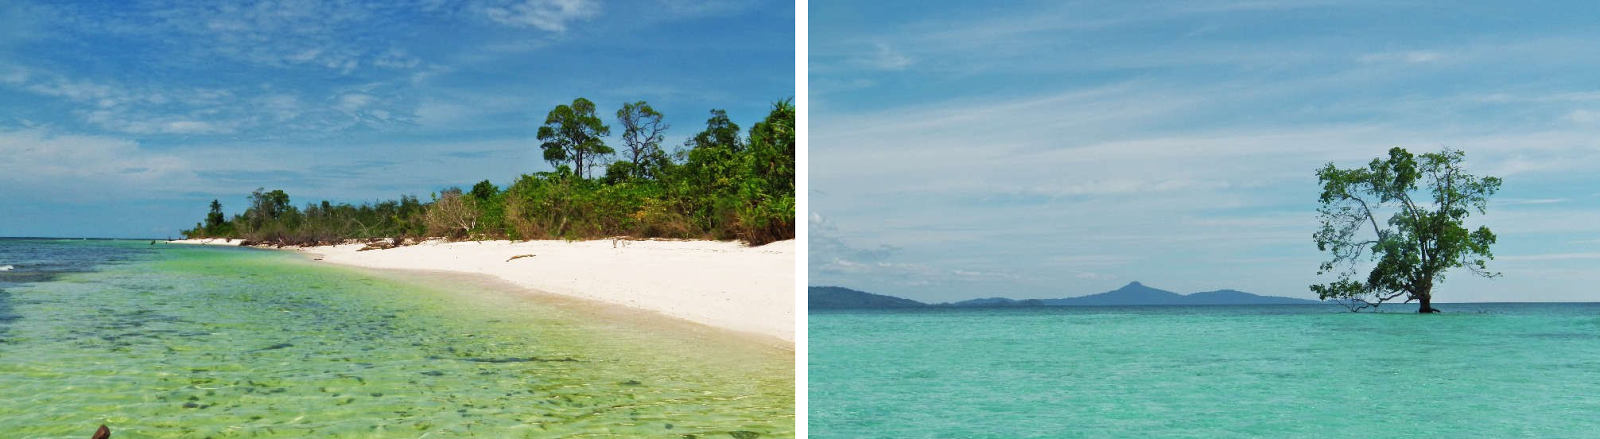 Wisata Ke Pulau Tabila